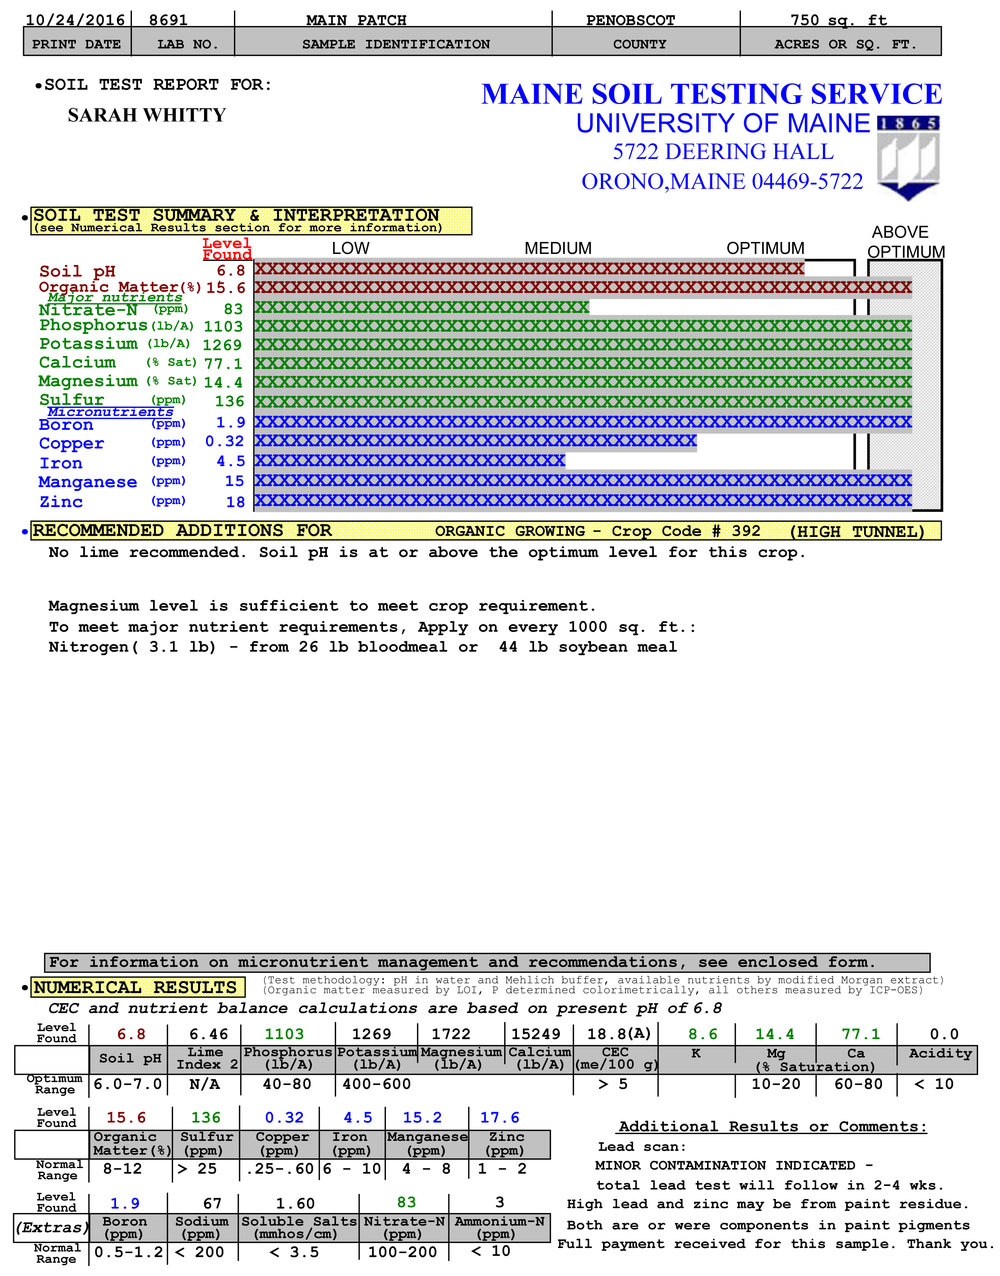 High organic matter in soil test